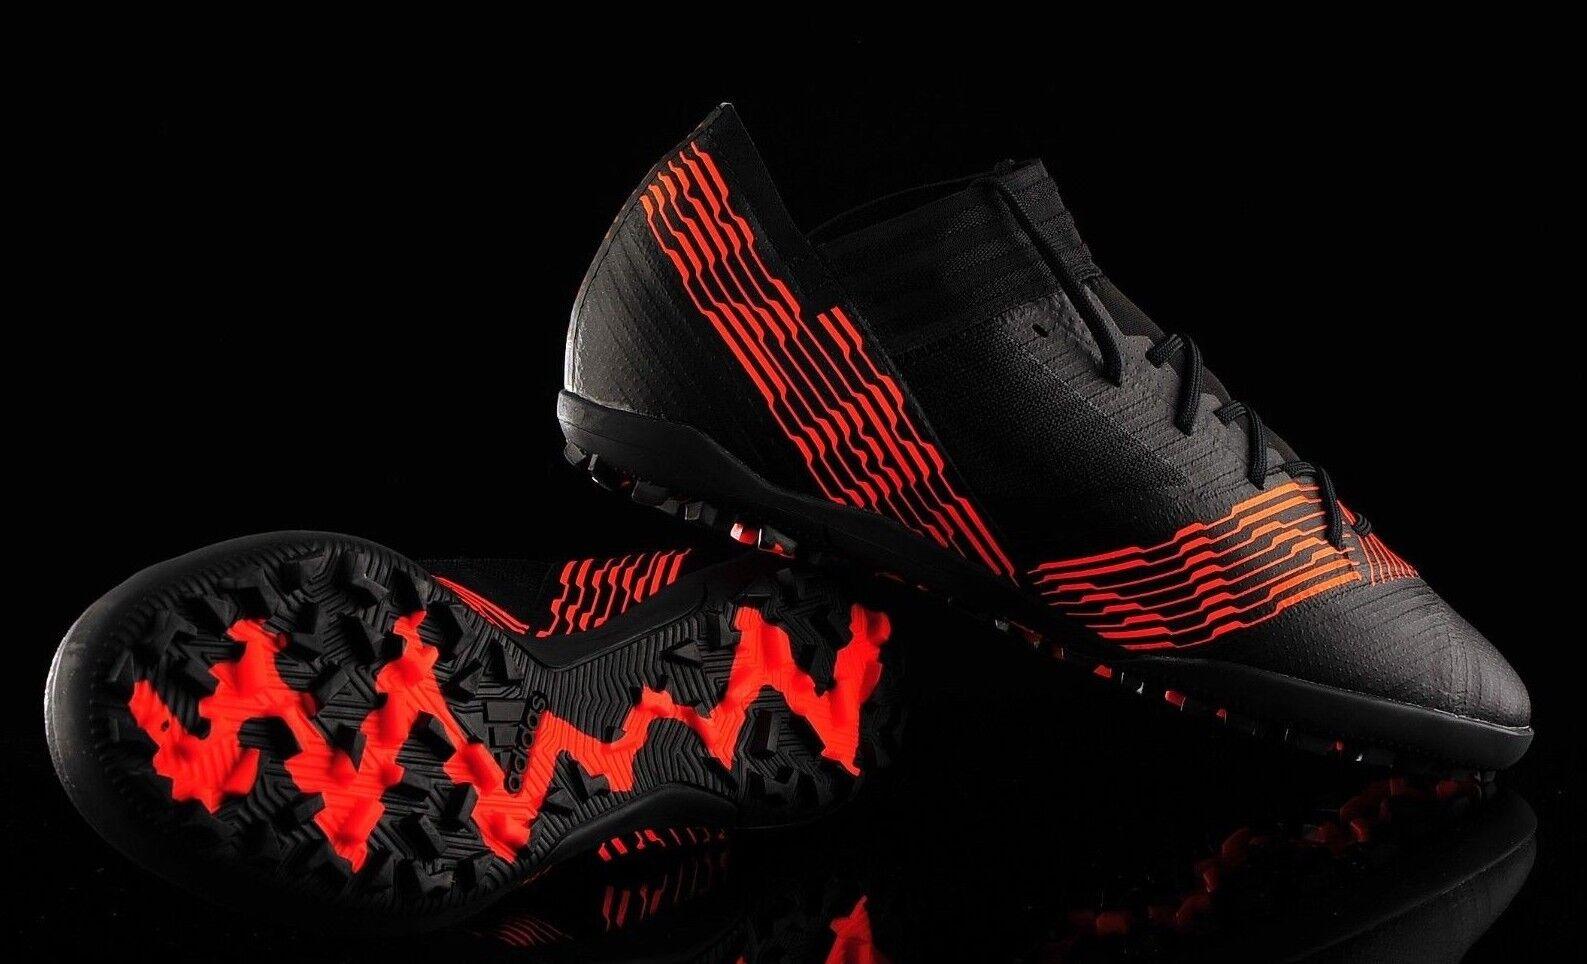 Adidas Men' Nemeziz Tango 17.3 Astro Turf Trainers Football Boots Play UK 8